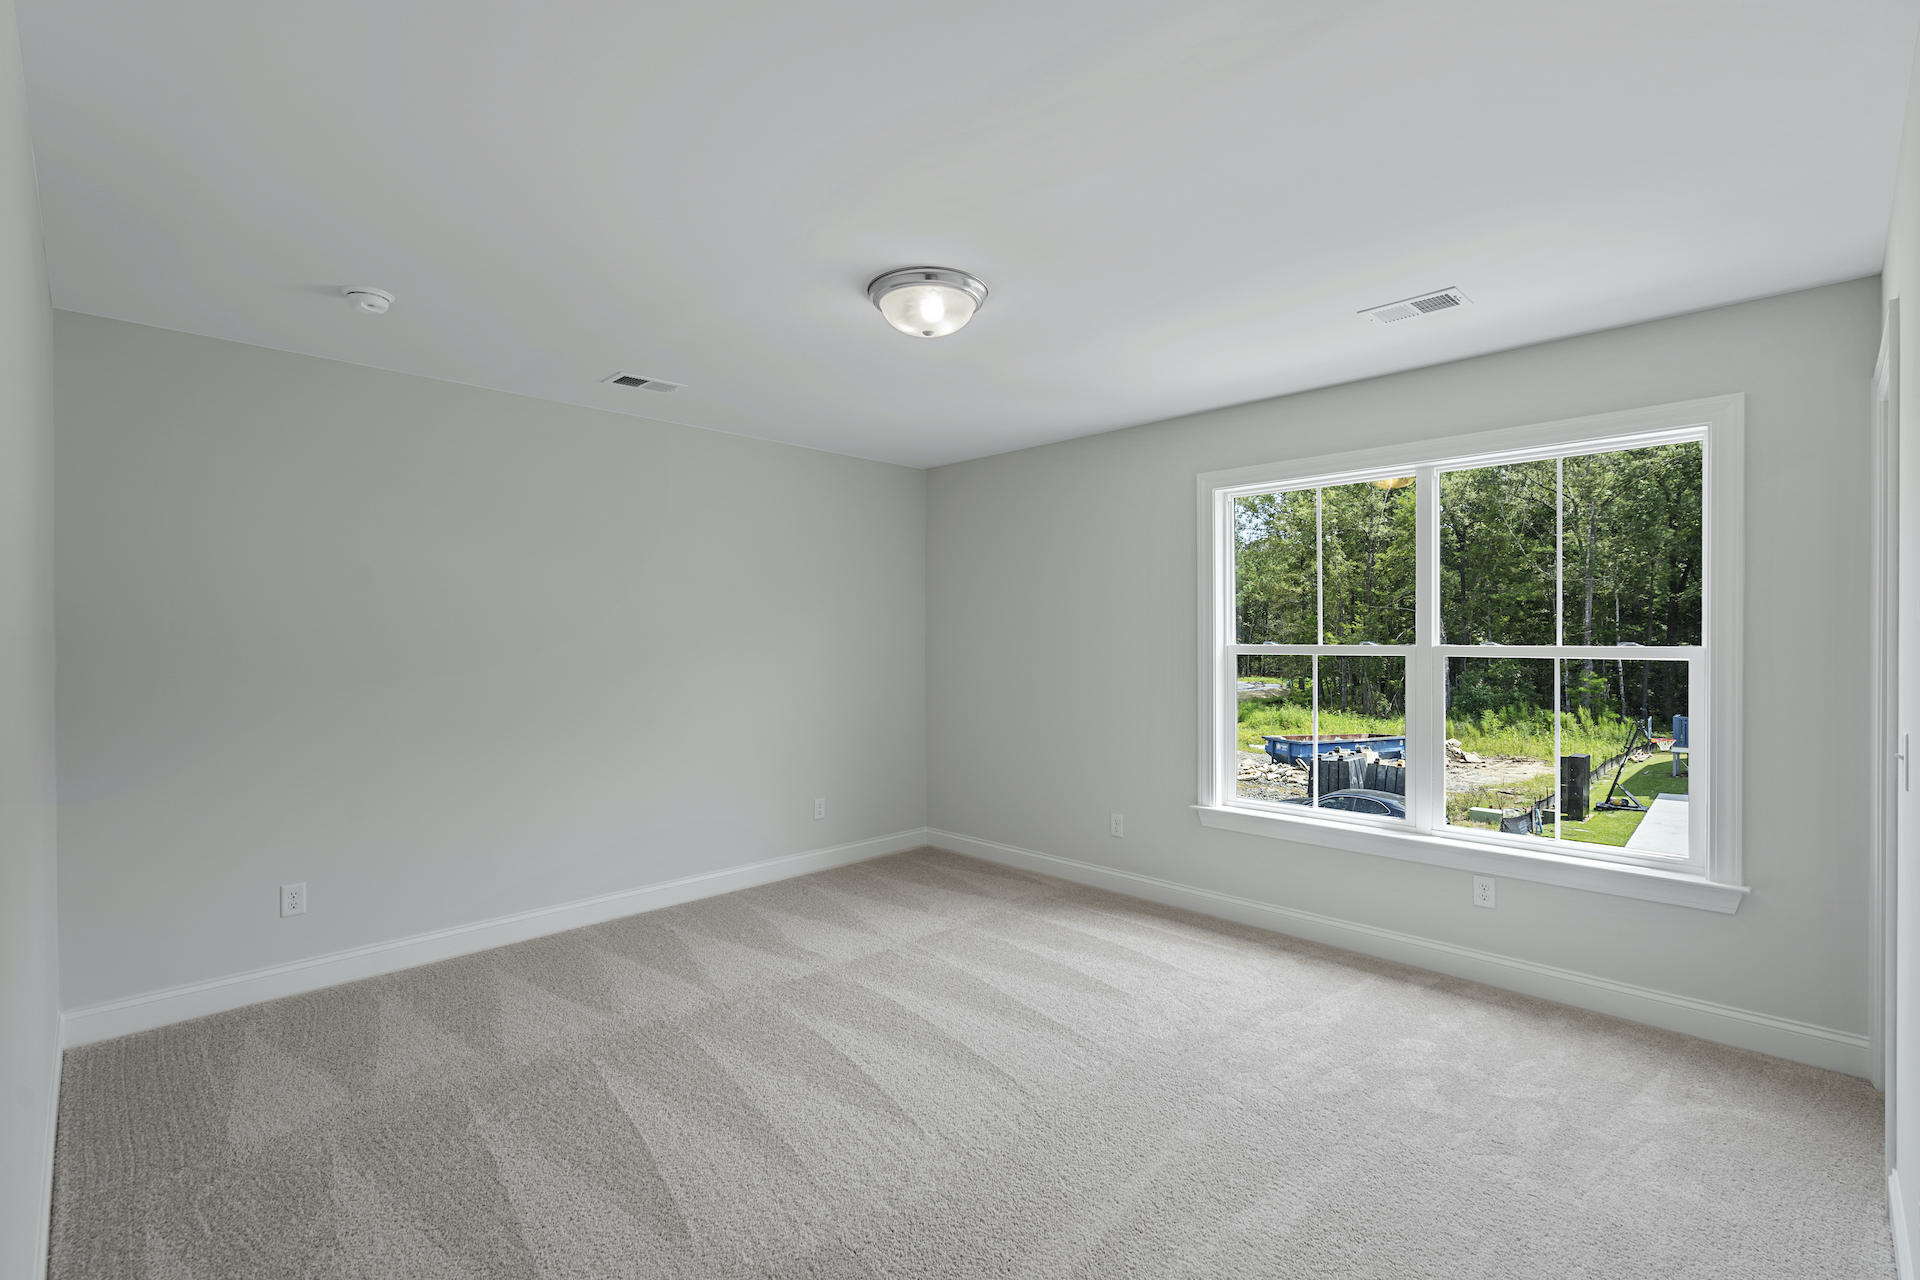 Drayton Oaks Homes For Sale - 105 Plowden Mill, Summerville, SC - 7